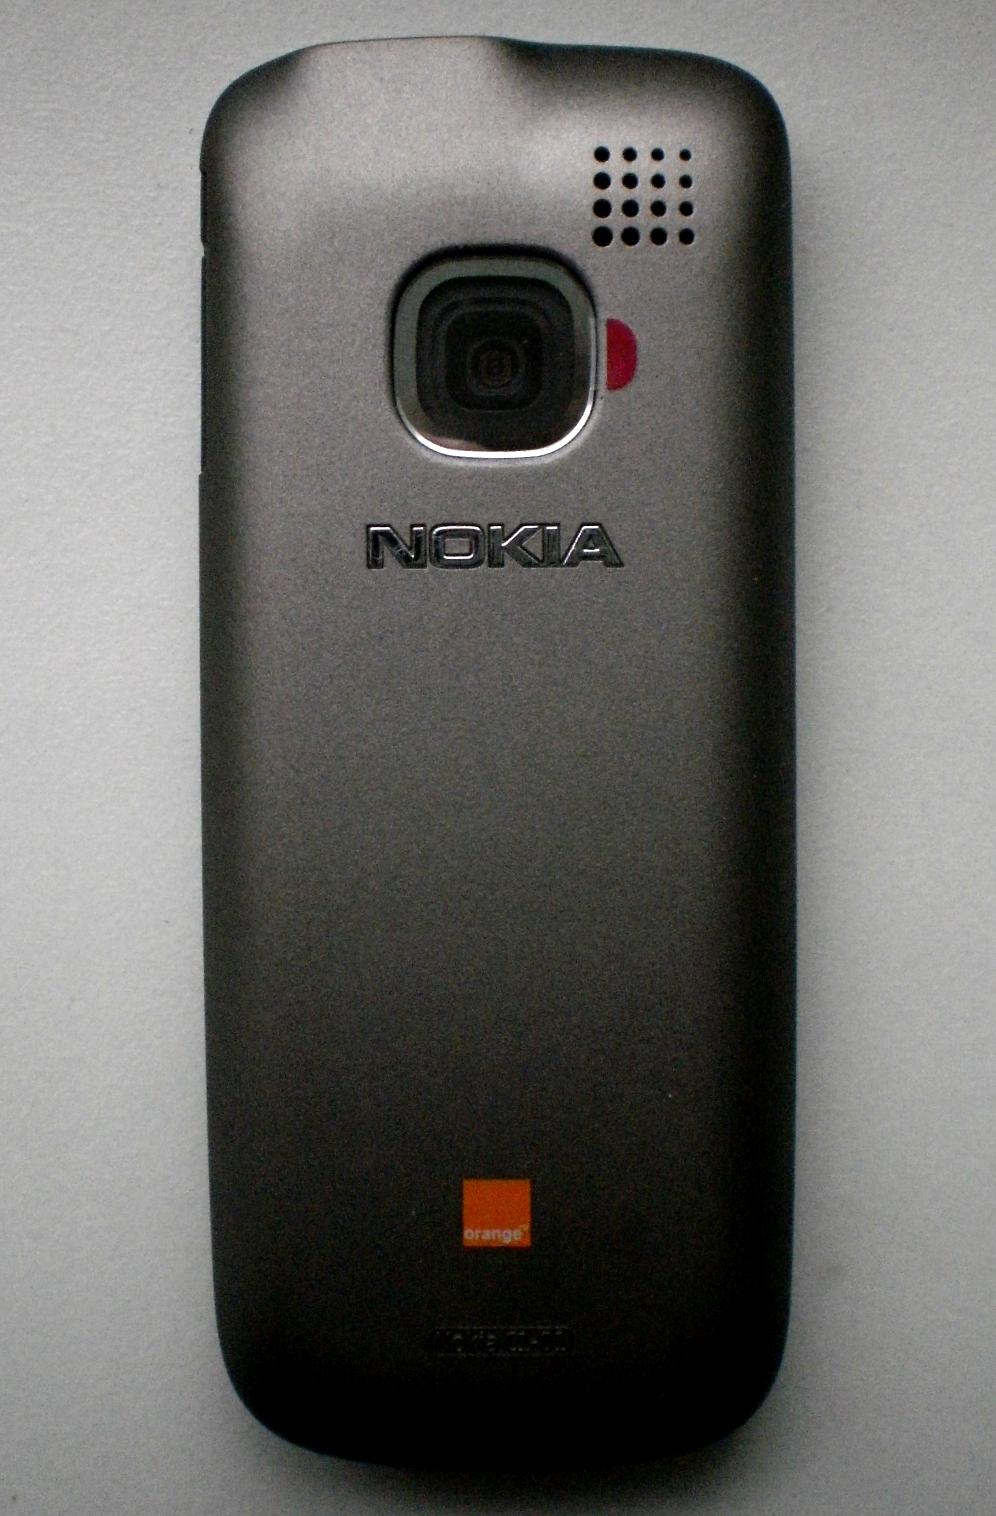 info for 05028 86208 File:Nokia C1-01 (back).jpg - Wikimedia Commons